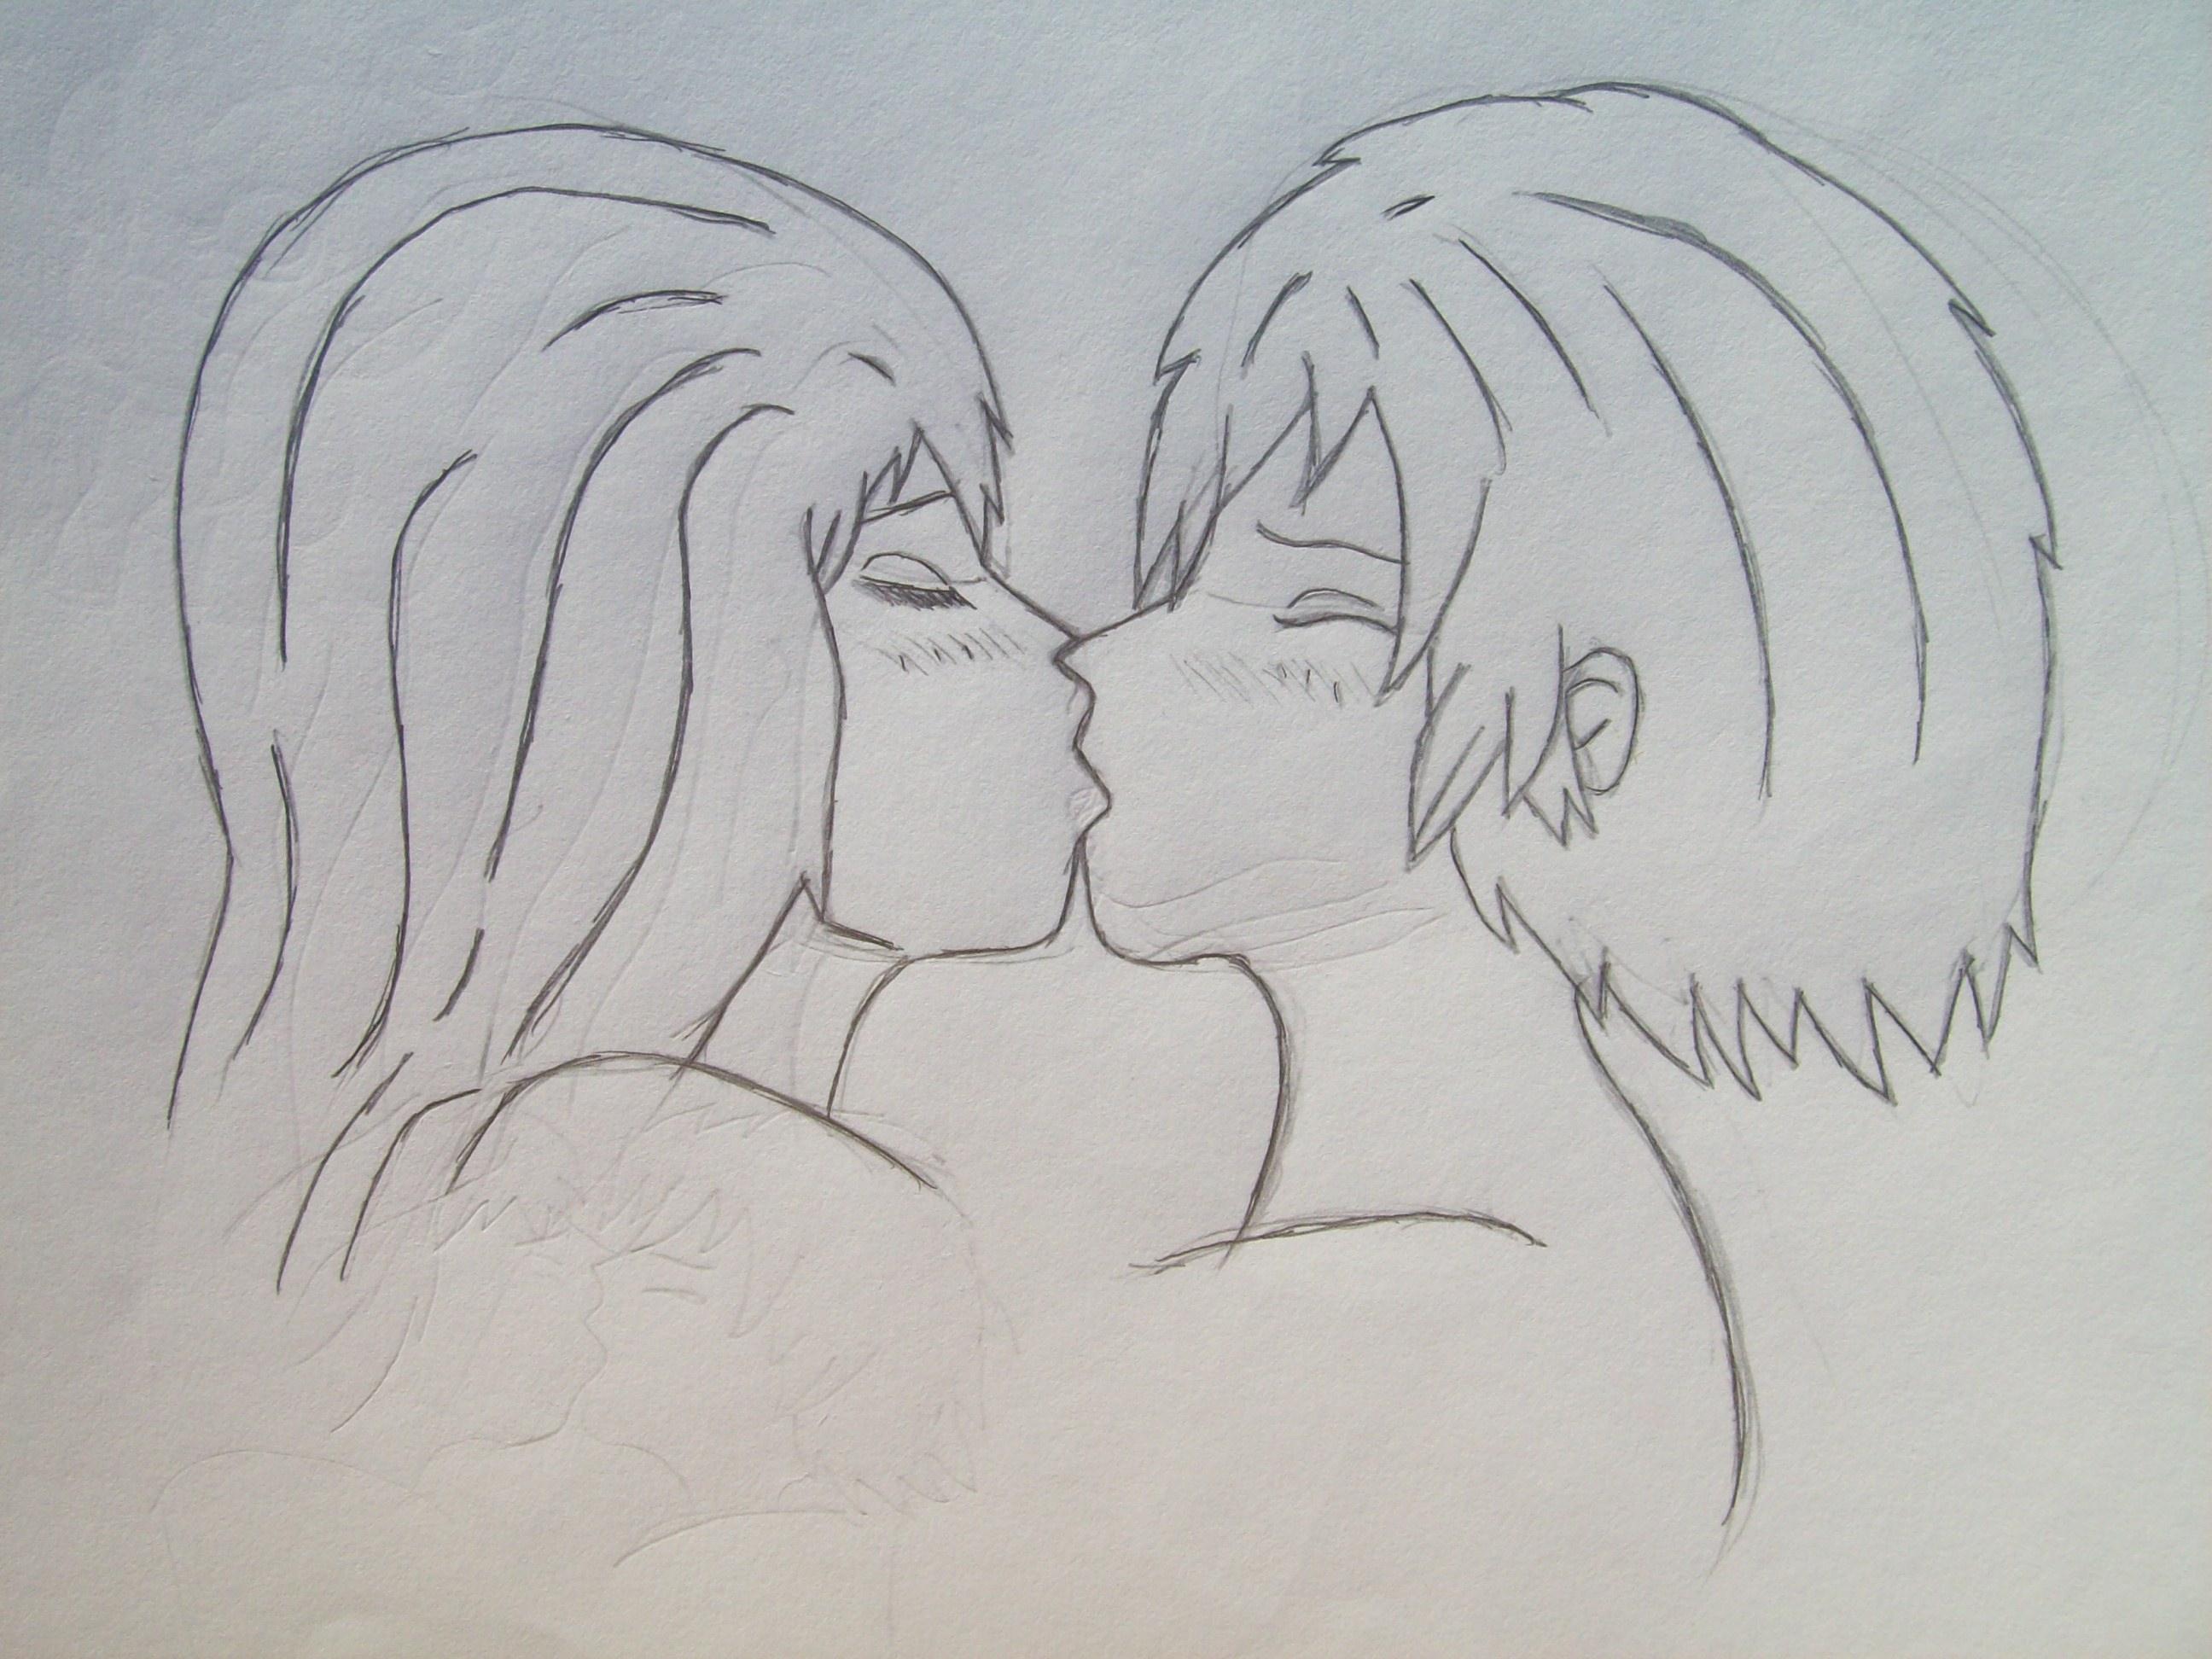 2592x1944 Boy Girl Kissing Pencil Sketch Hd Wallpaper Boy And Girl Kissing